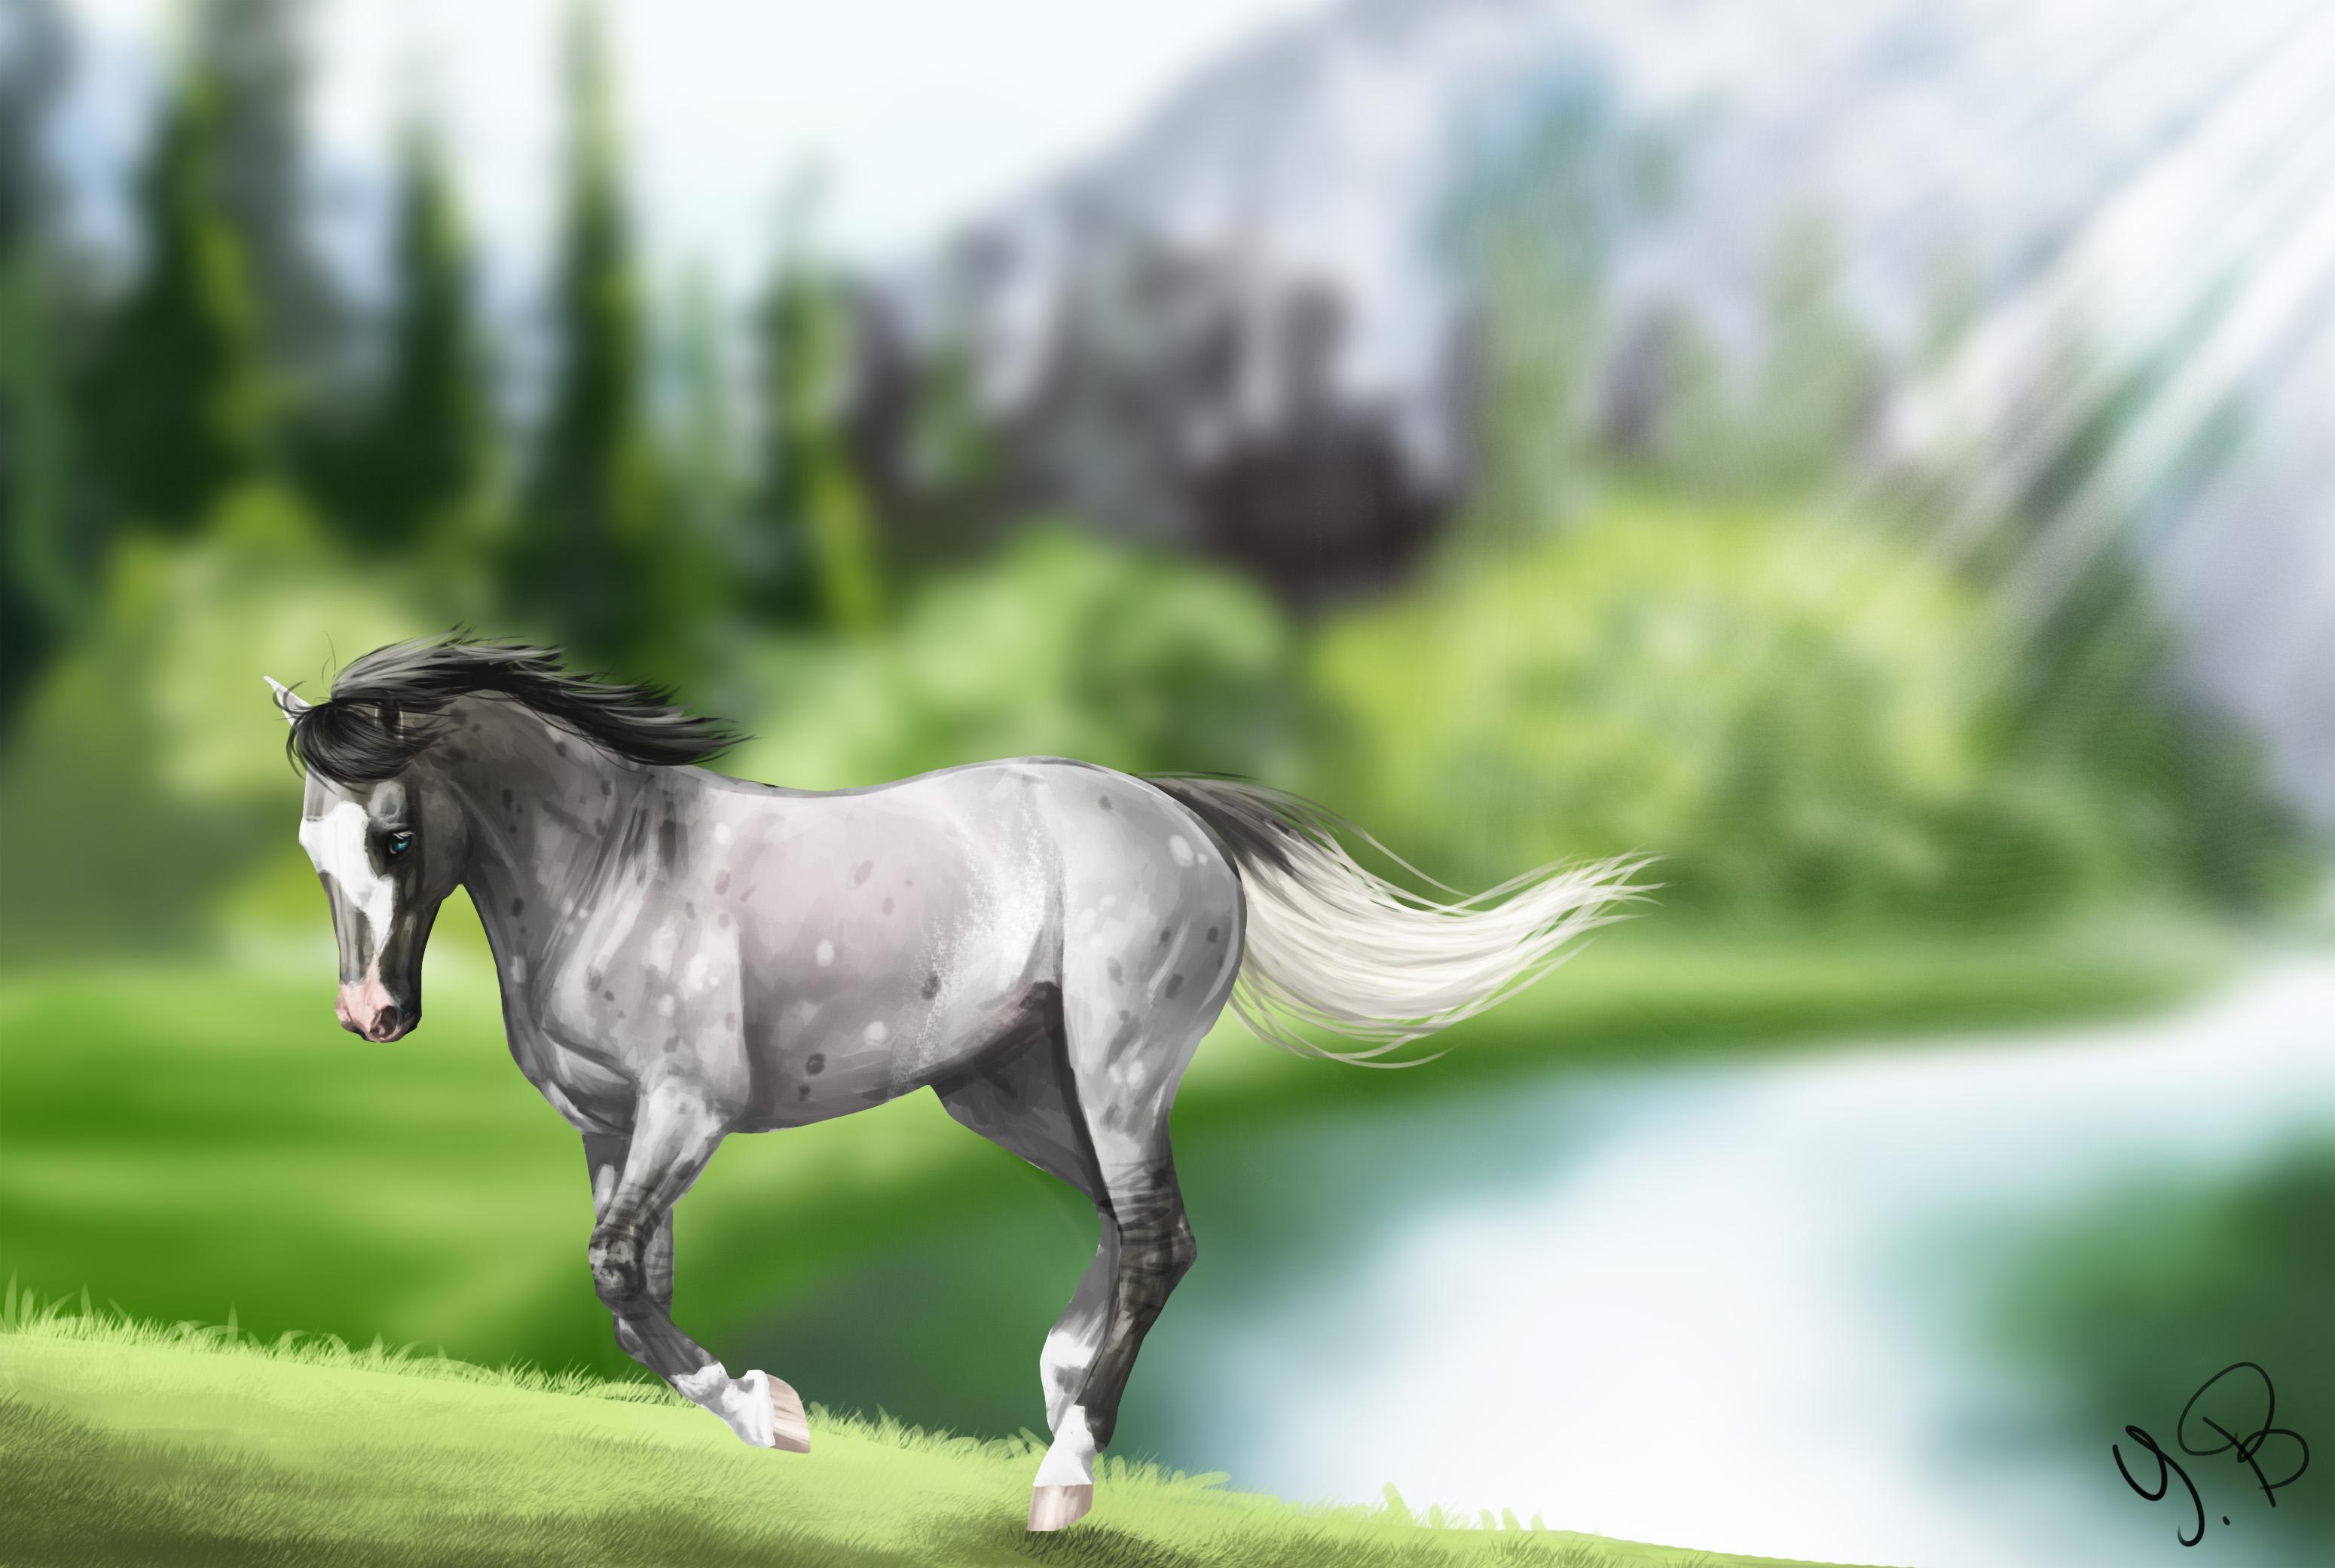 Beautiful Wallpaper Horse Wolf - tumblr_static_e2qhctm47o8c4gcg4c80c4sc4  You Should Have_166893.jpg